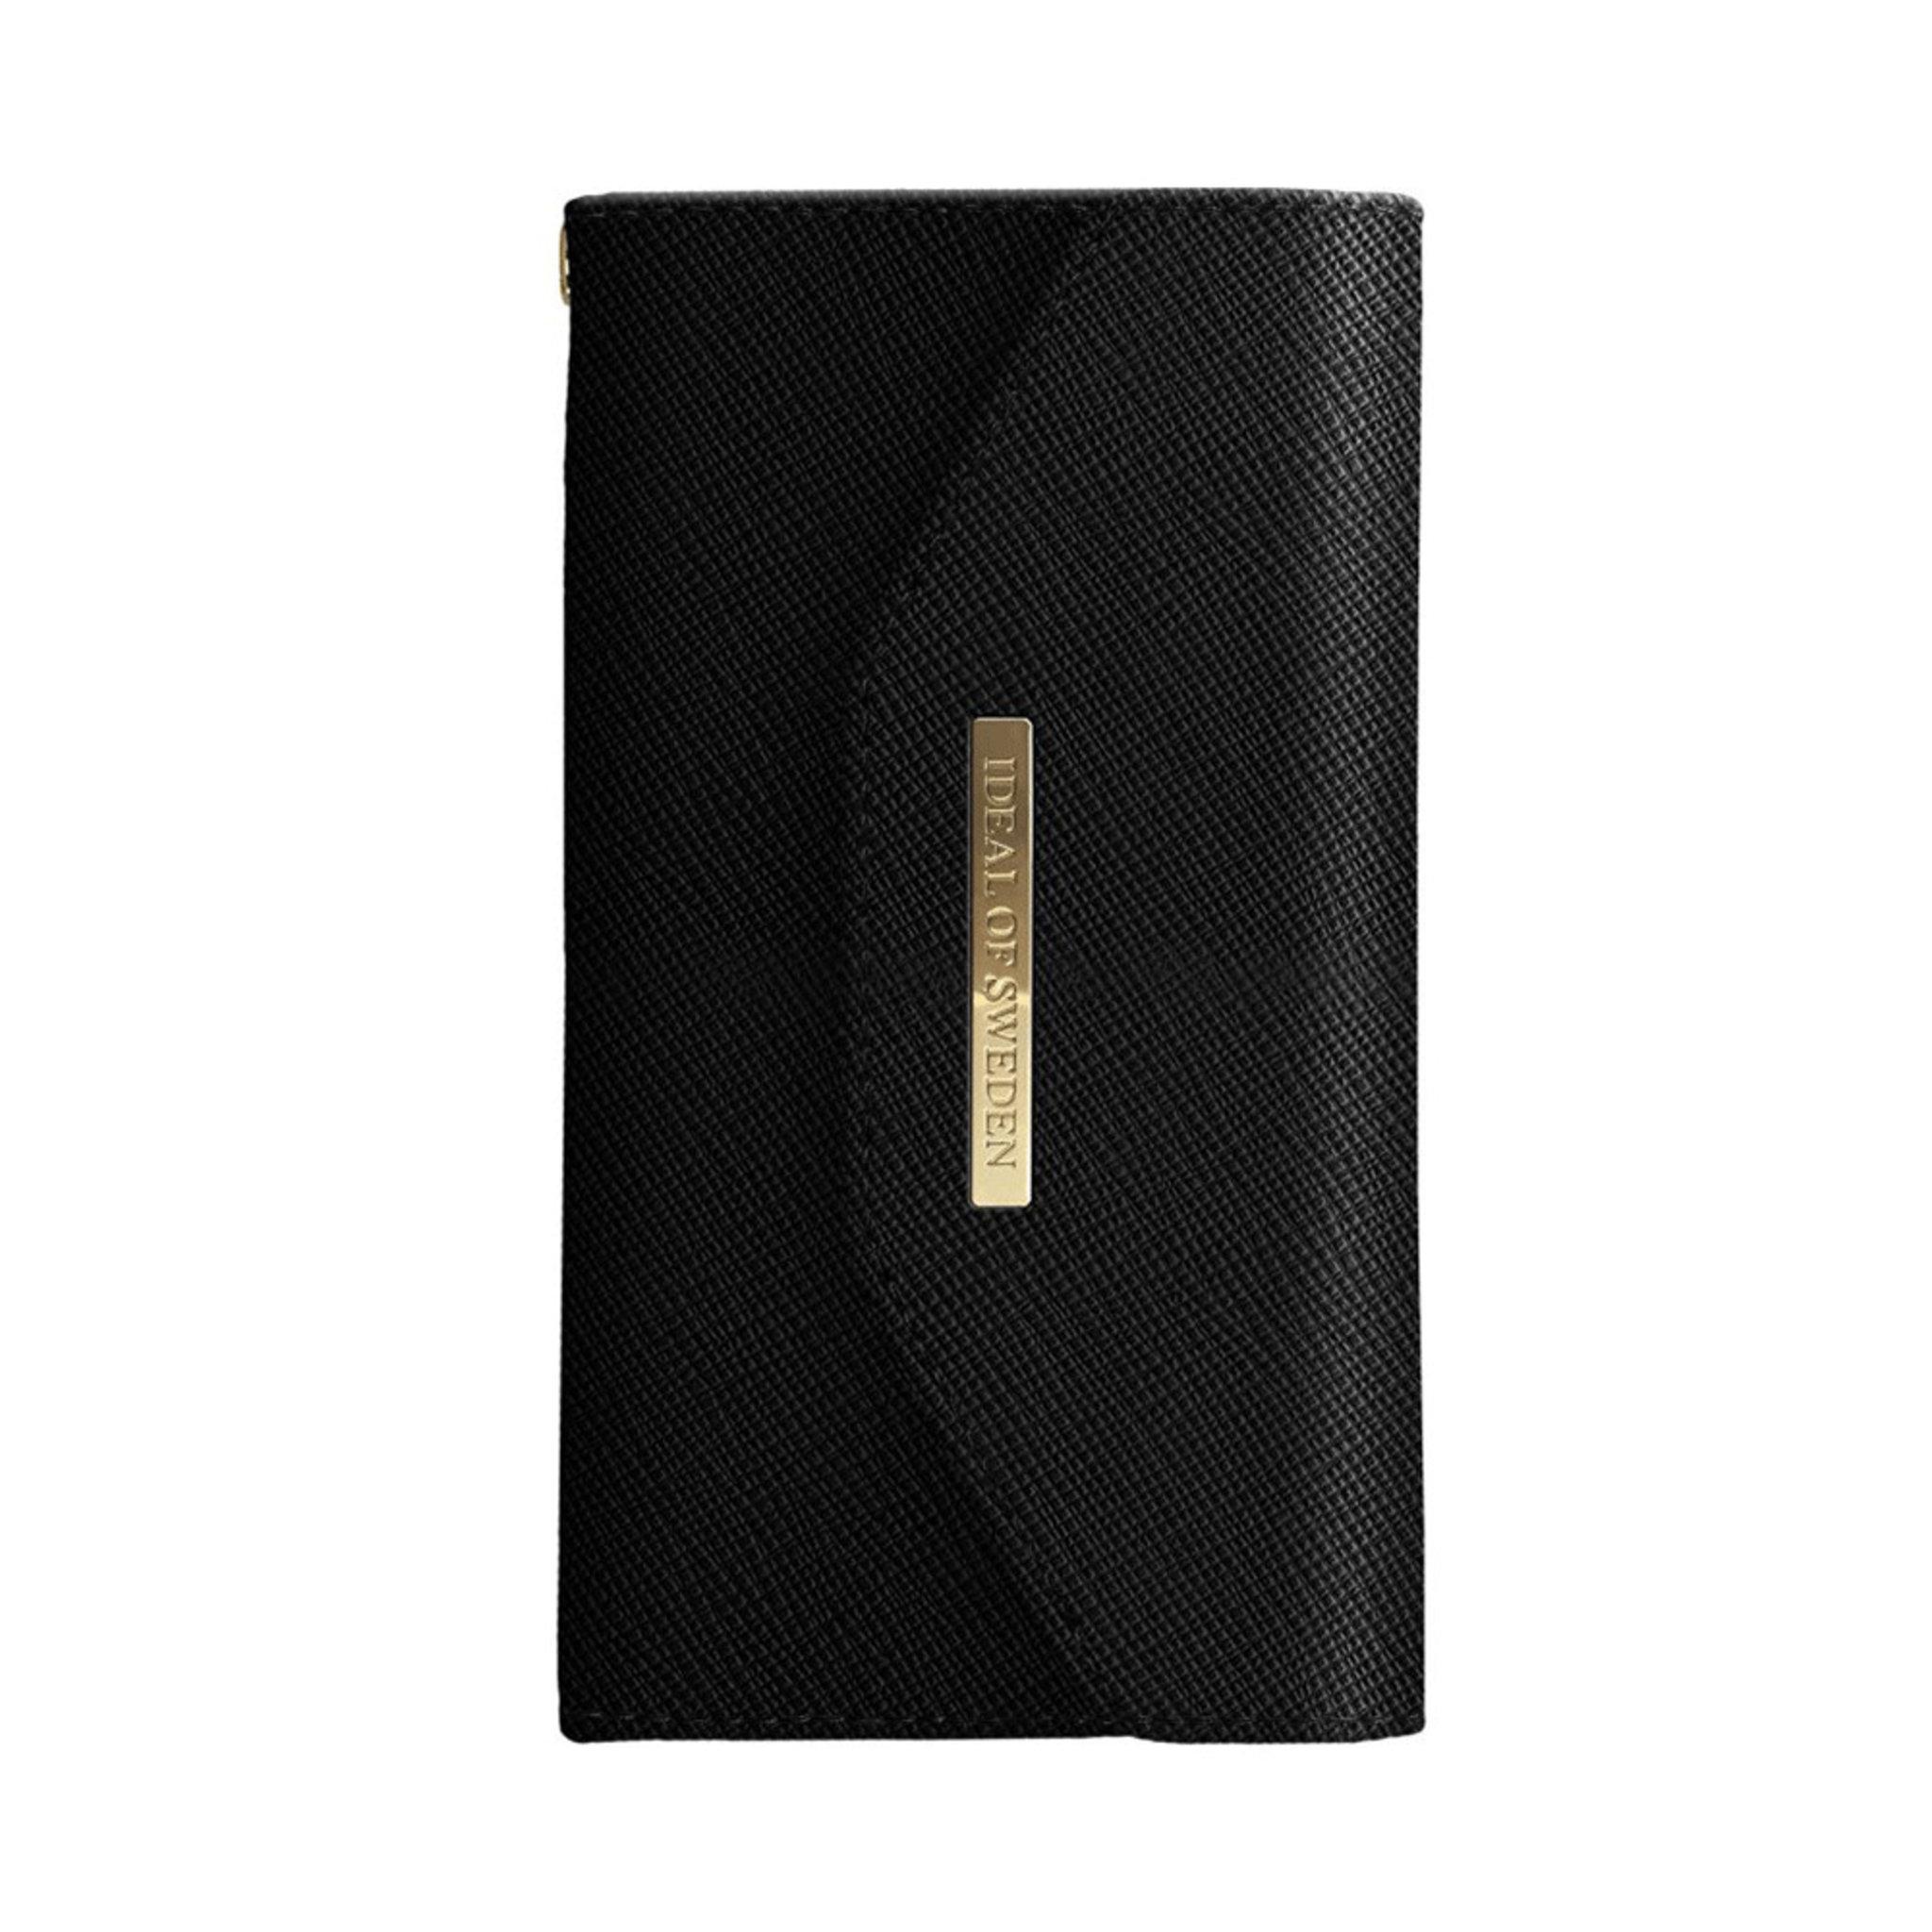 Plånboksväska Mayfair clutch iPhone 6 6S 7 8 Plus - Mobiltillbehör - Köp  online på åhlens.se! 9095c1b08f212